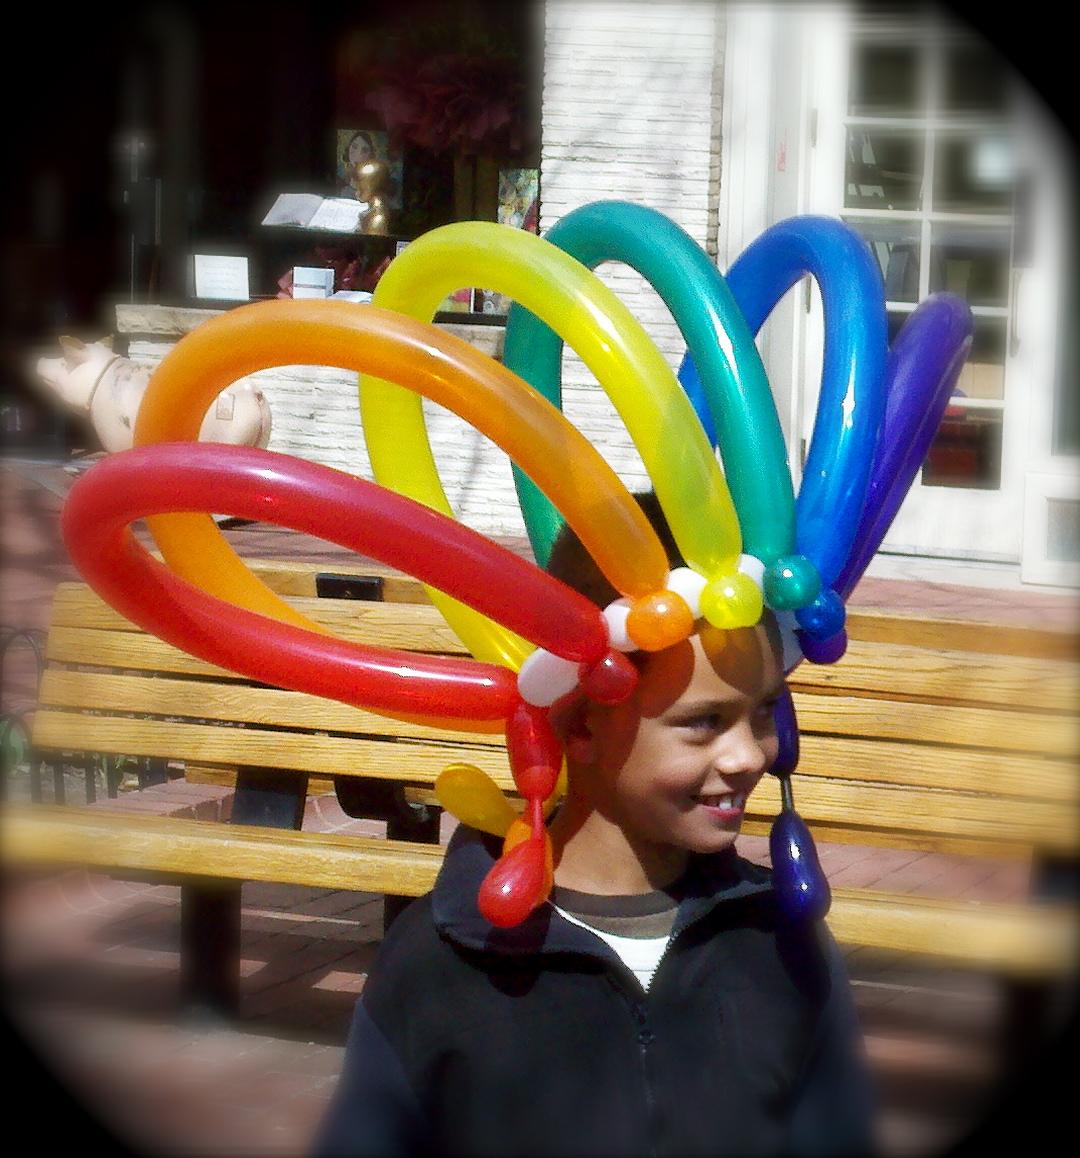 Balloon hats tag hats